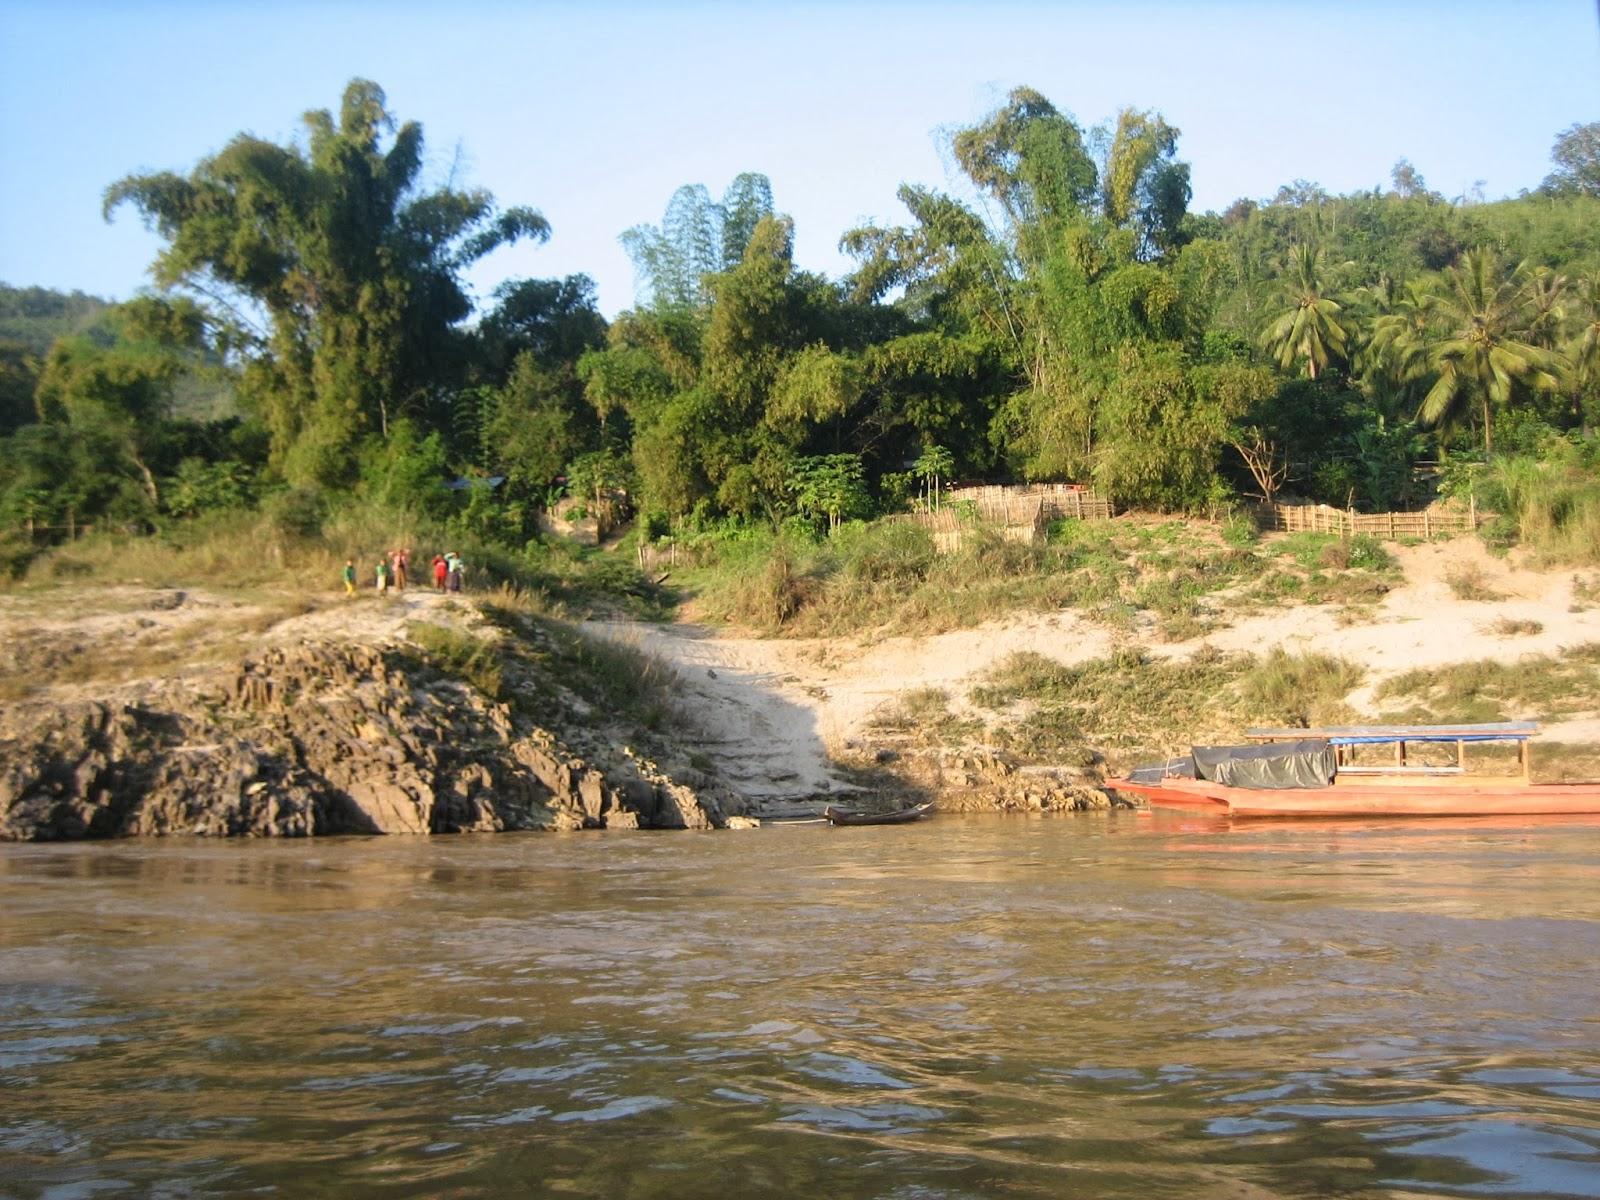 laos-mekong-river-thailand-slow-boat